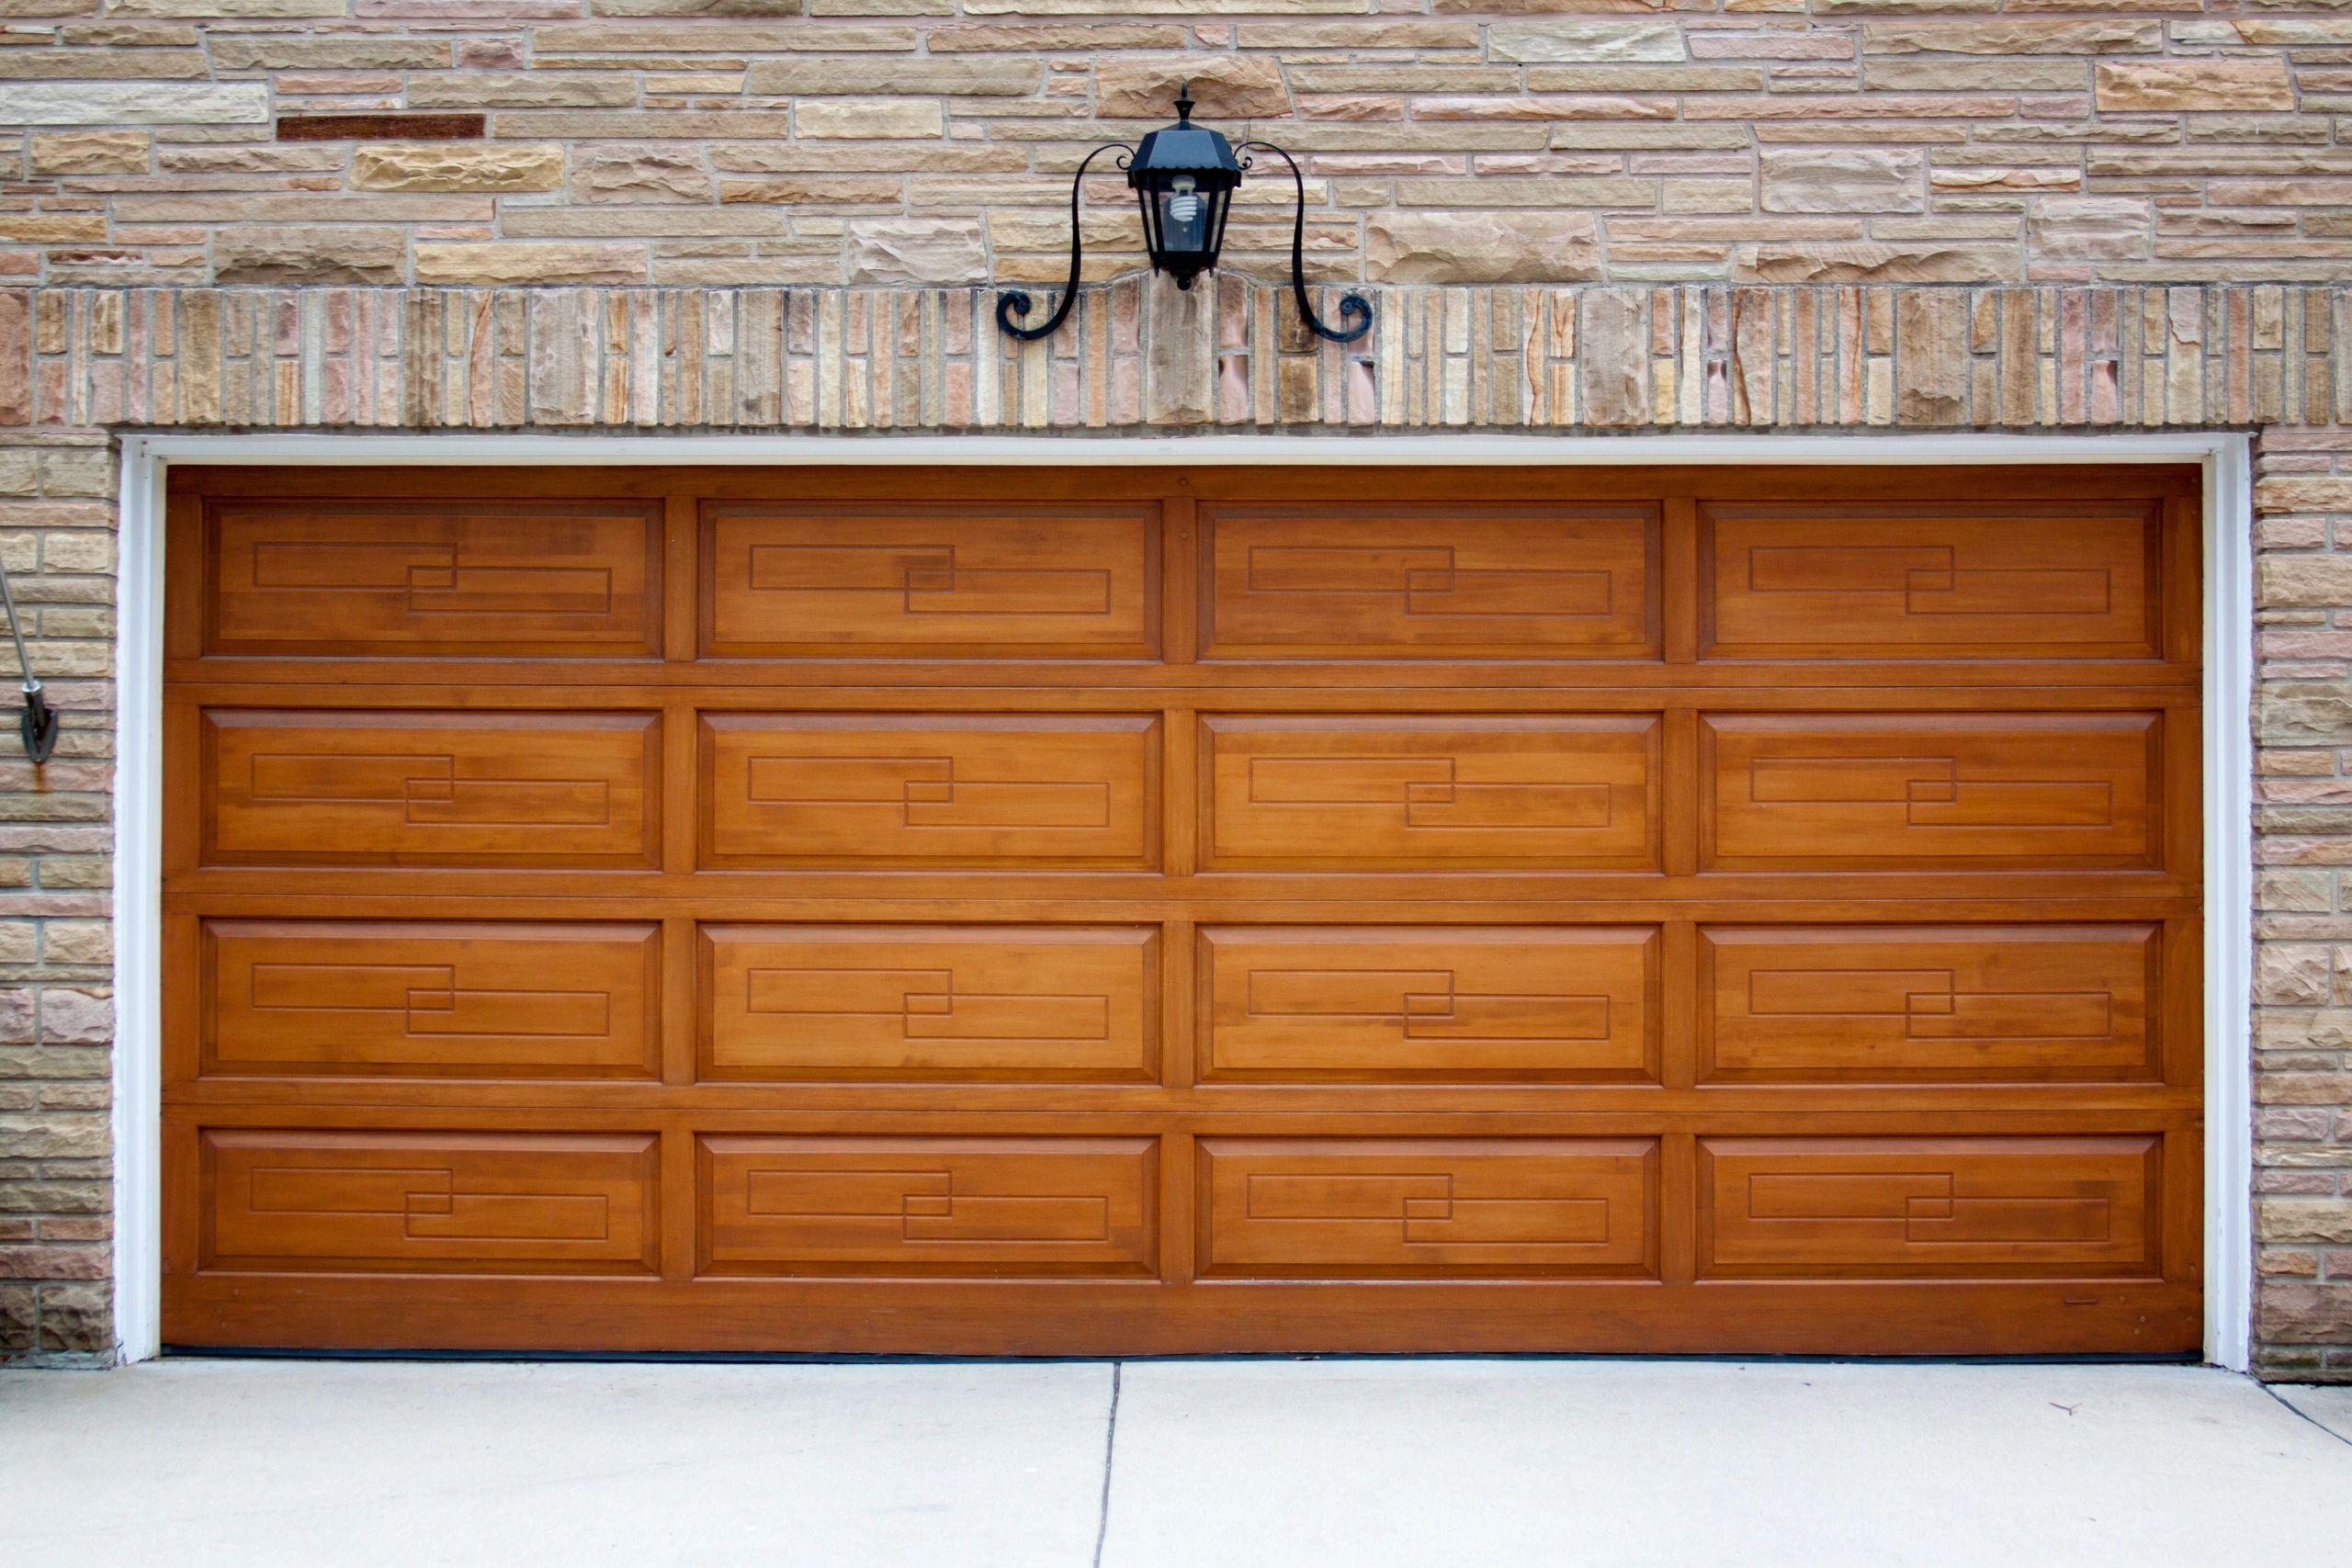 Awesome Garage Door Repair And Maintenance   Powers Garage Doors